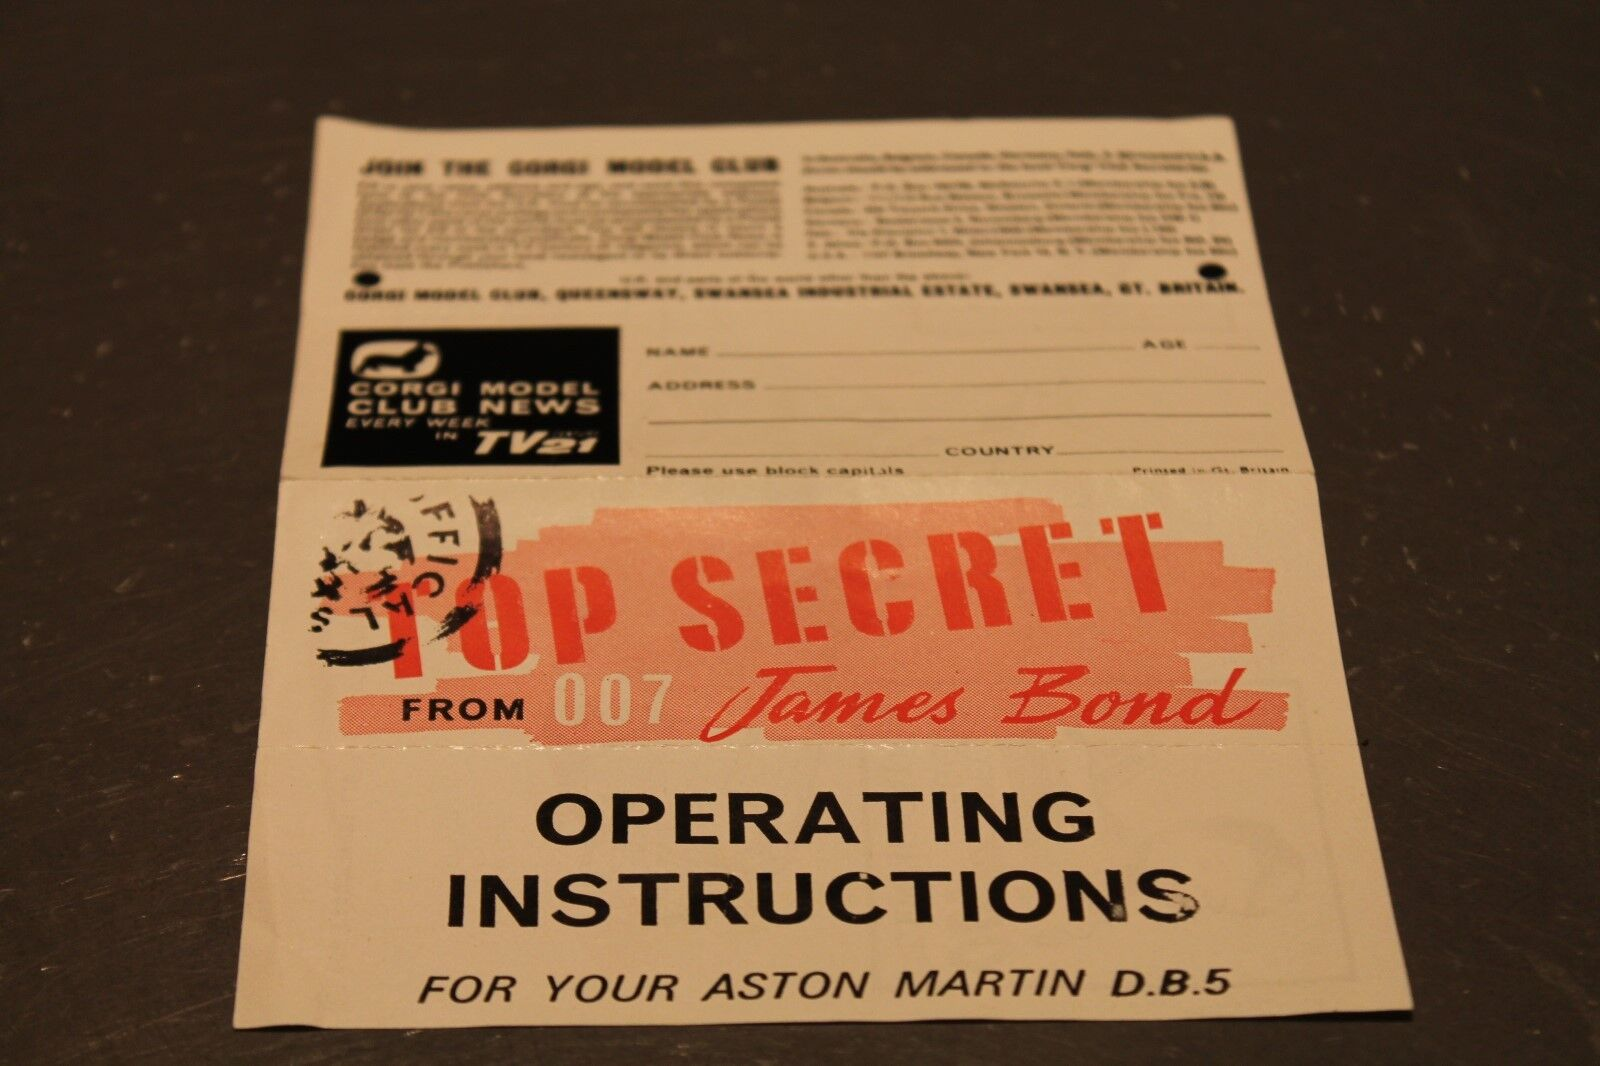 marcas de moda Corgi Juguetes  club leaflet & description aston martin martin martin db5  Top Secret  diseño simple y generoso